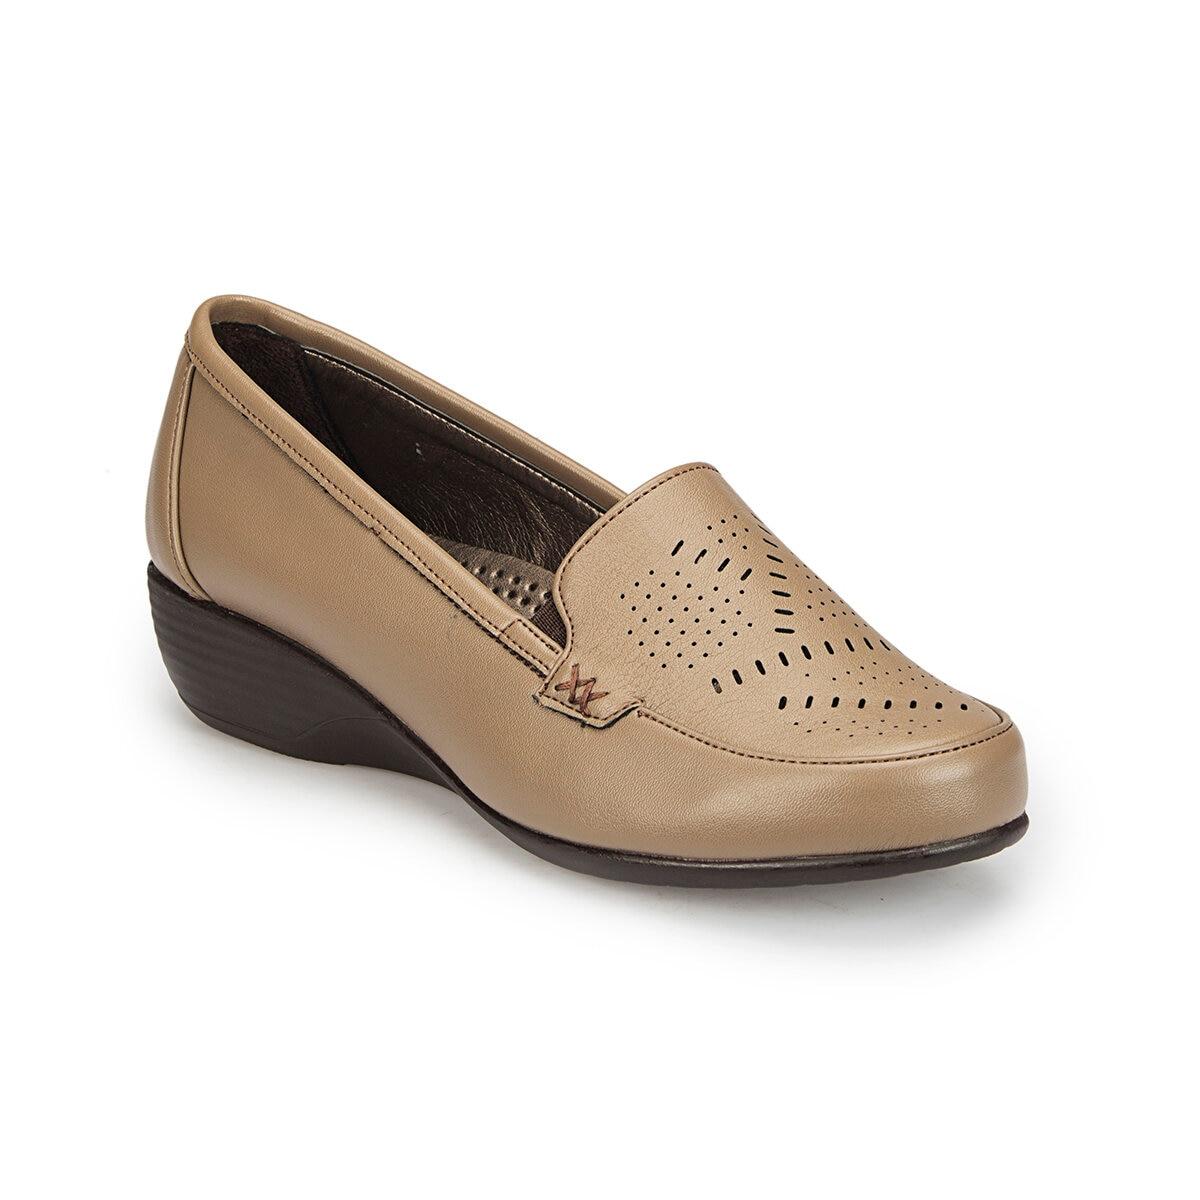 FLO 81.158476.Z Mink Women Basic Comfort Polaris